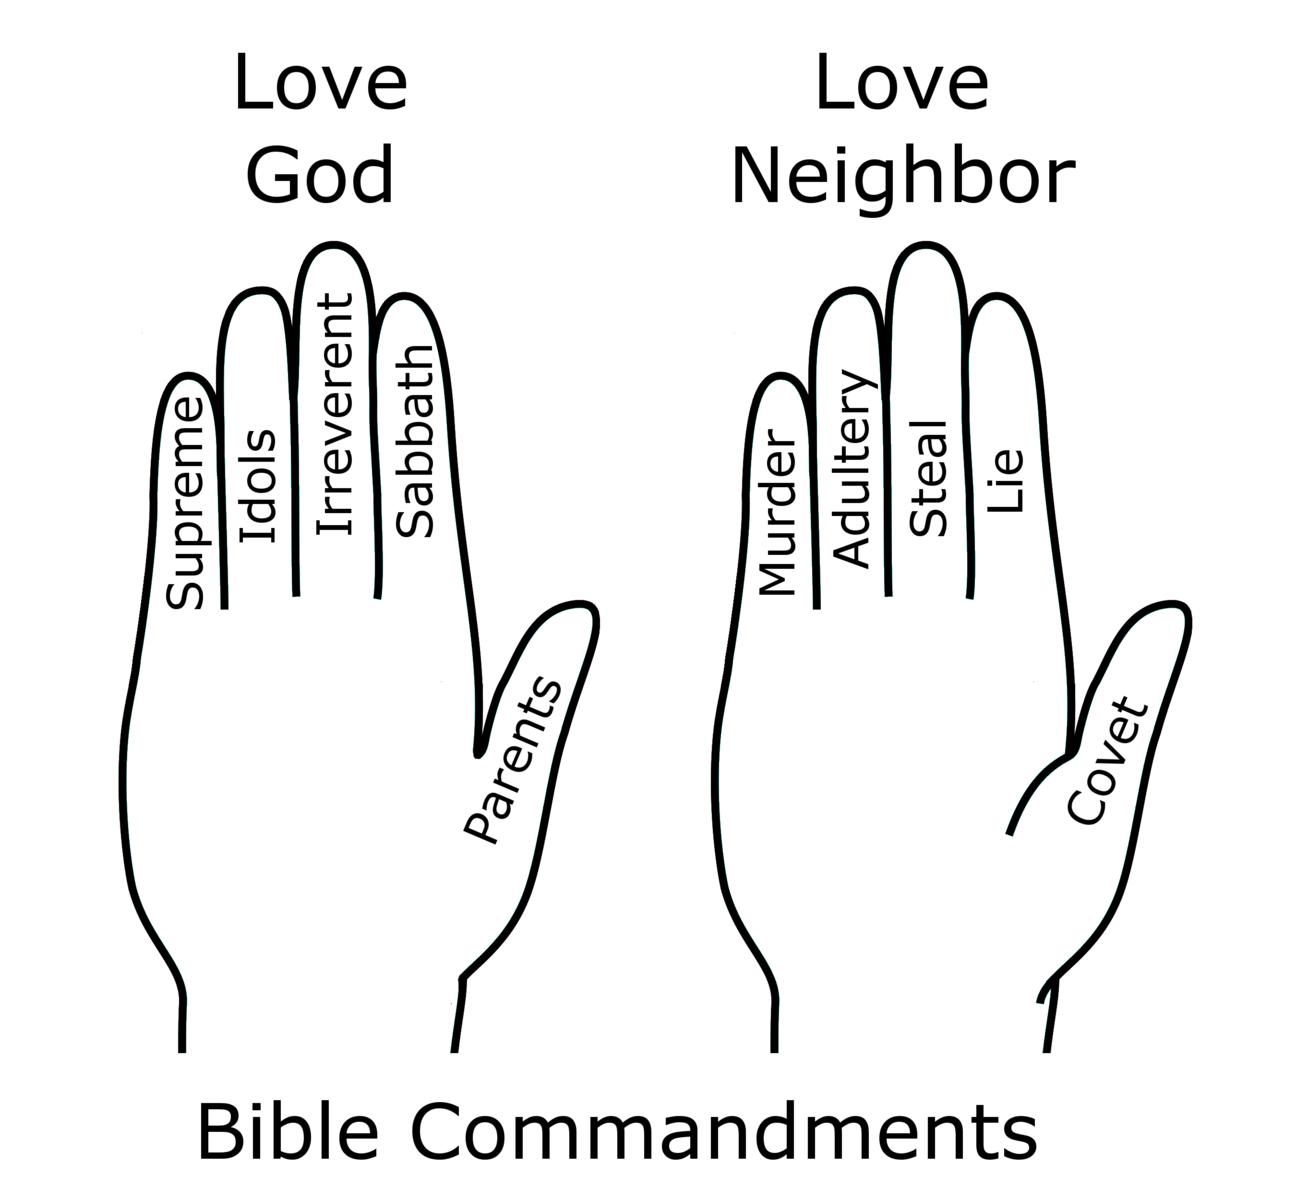 File:Bible Commandments Hand Mnemonic.png